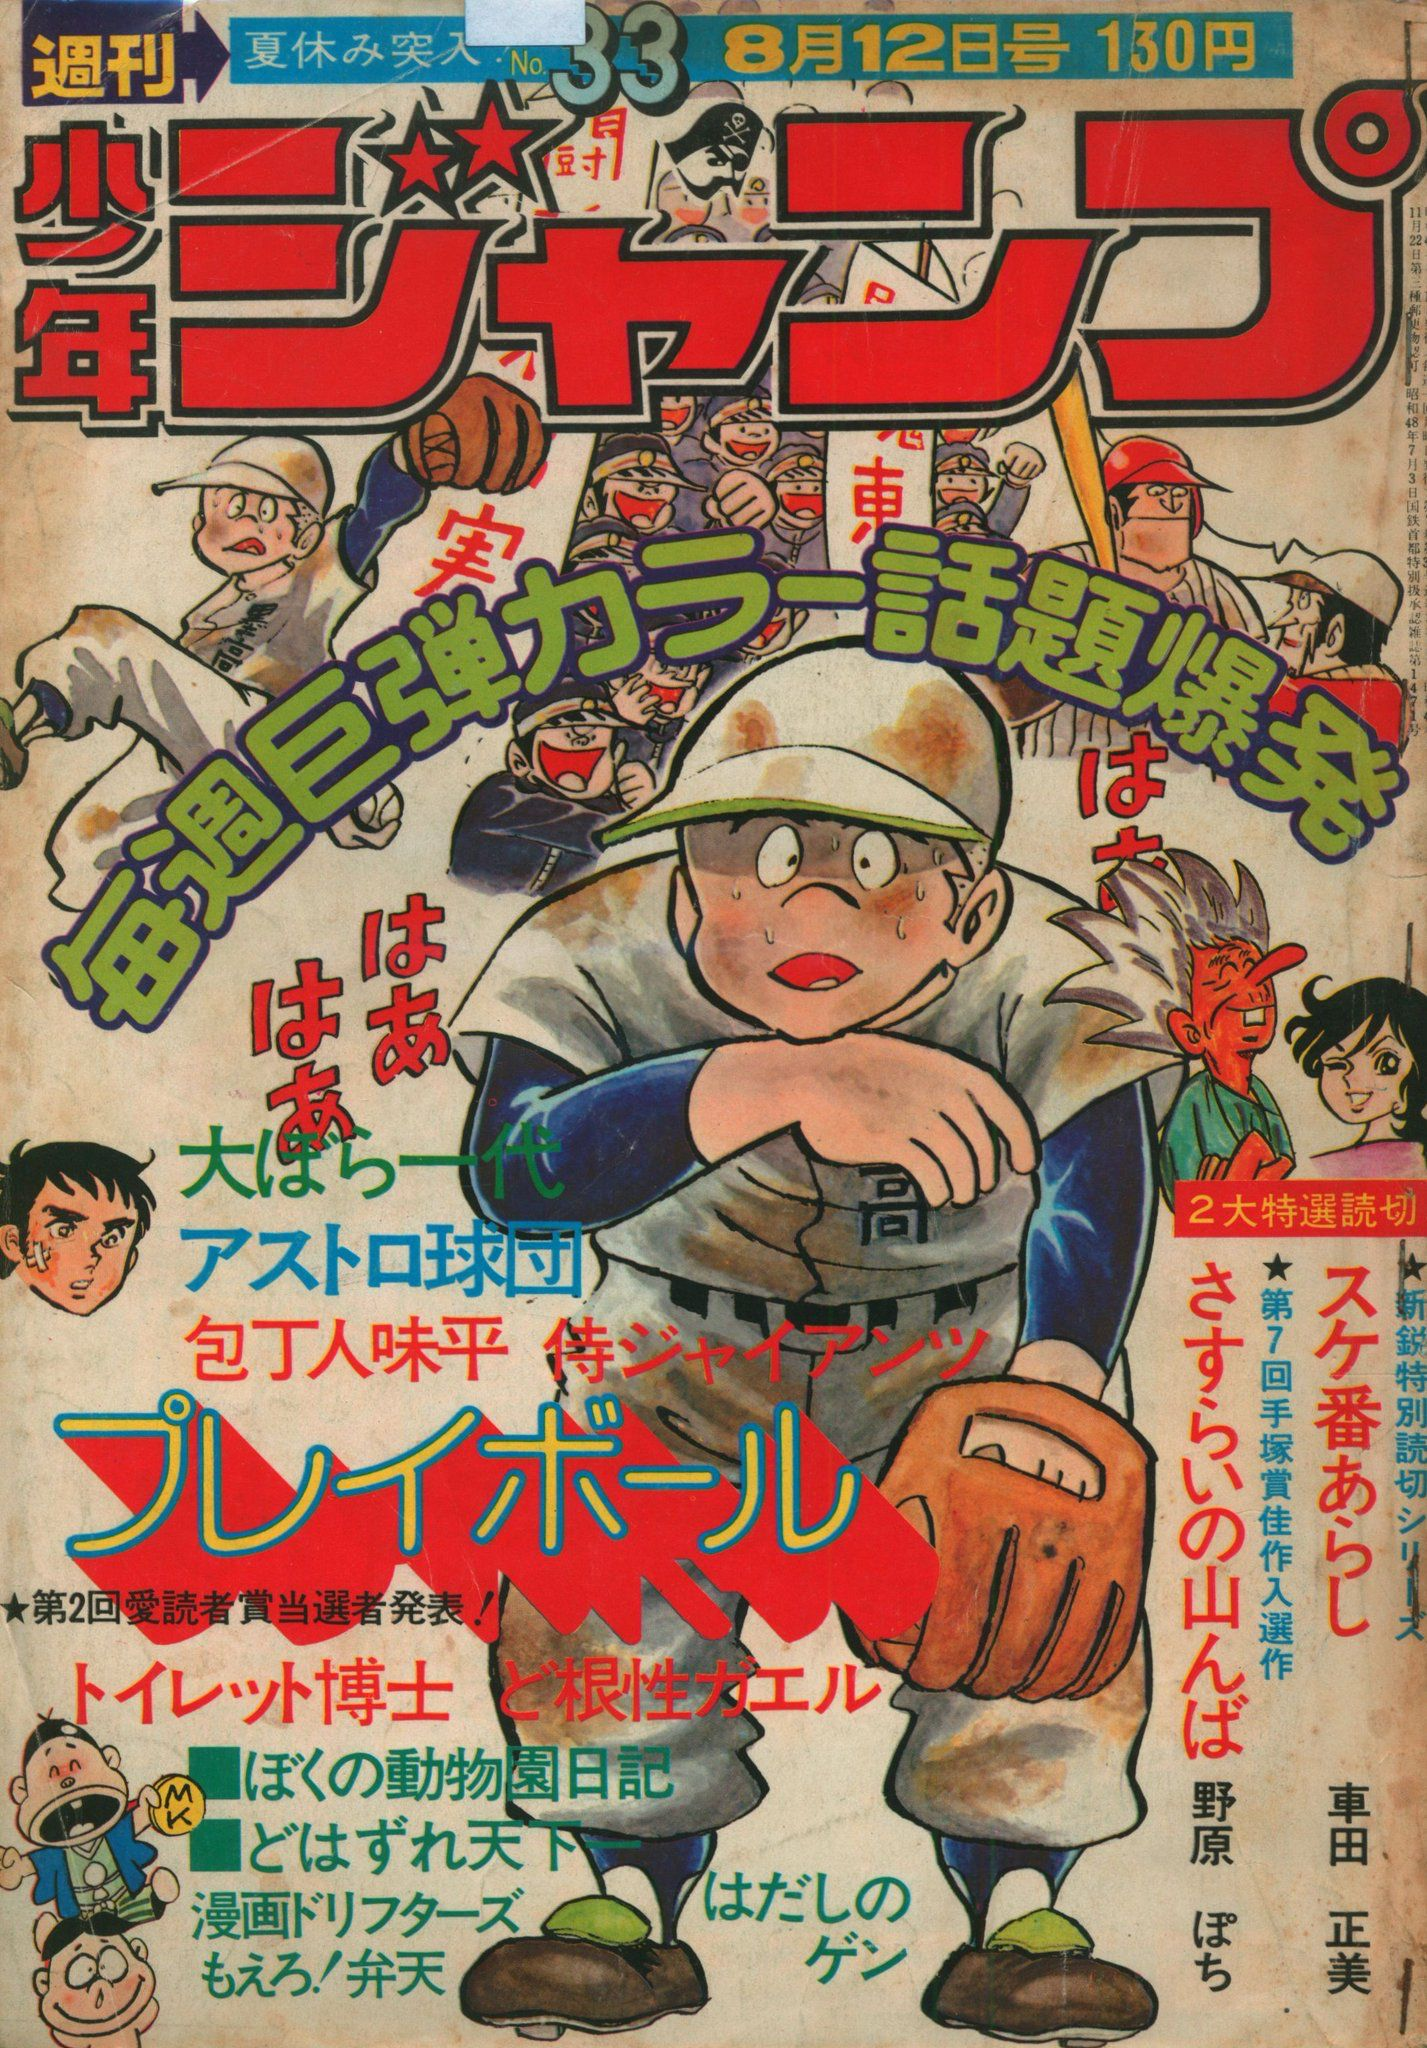 pin by kamal fareed on old anime manga cover nostalgia manga covers japanese pop culture manga